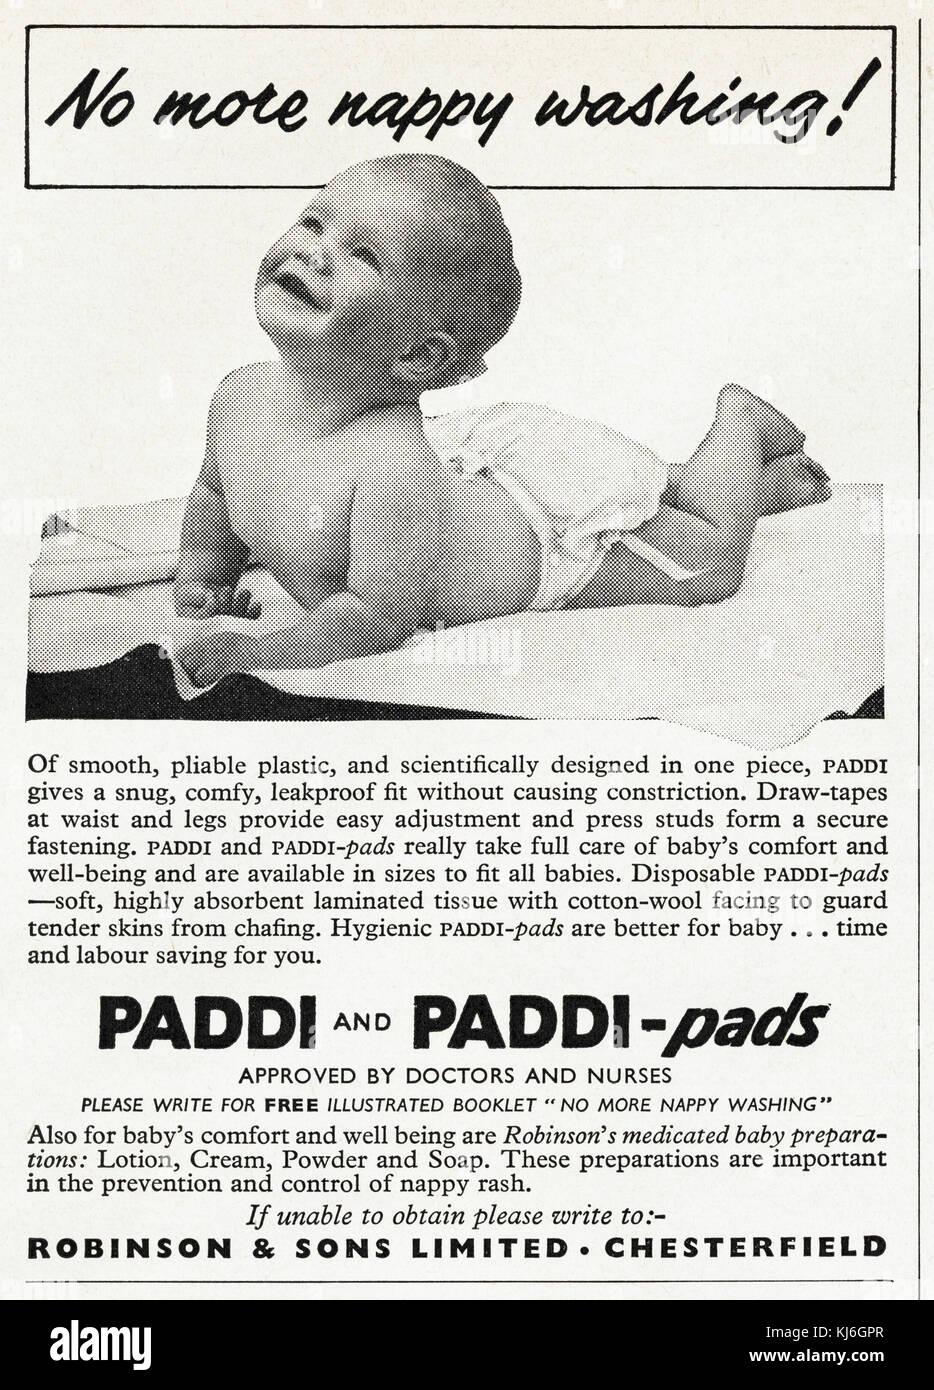 1950s old vintage original advert british magazine print advertisement advertising Paddi-pads babies nappies dated - Stock Image